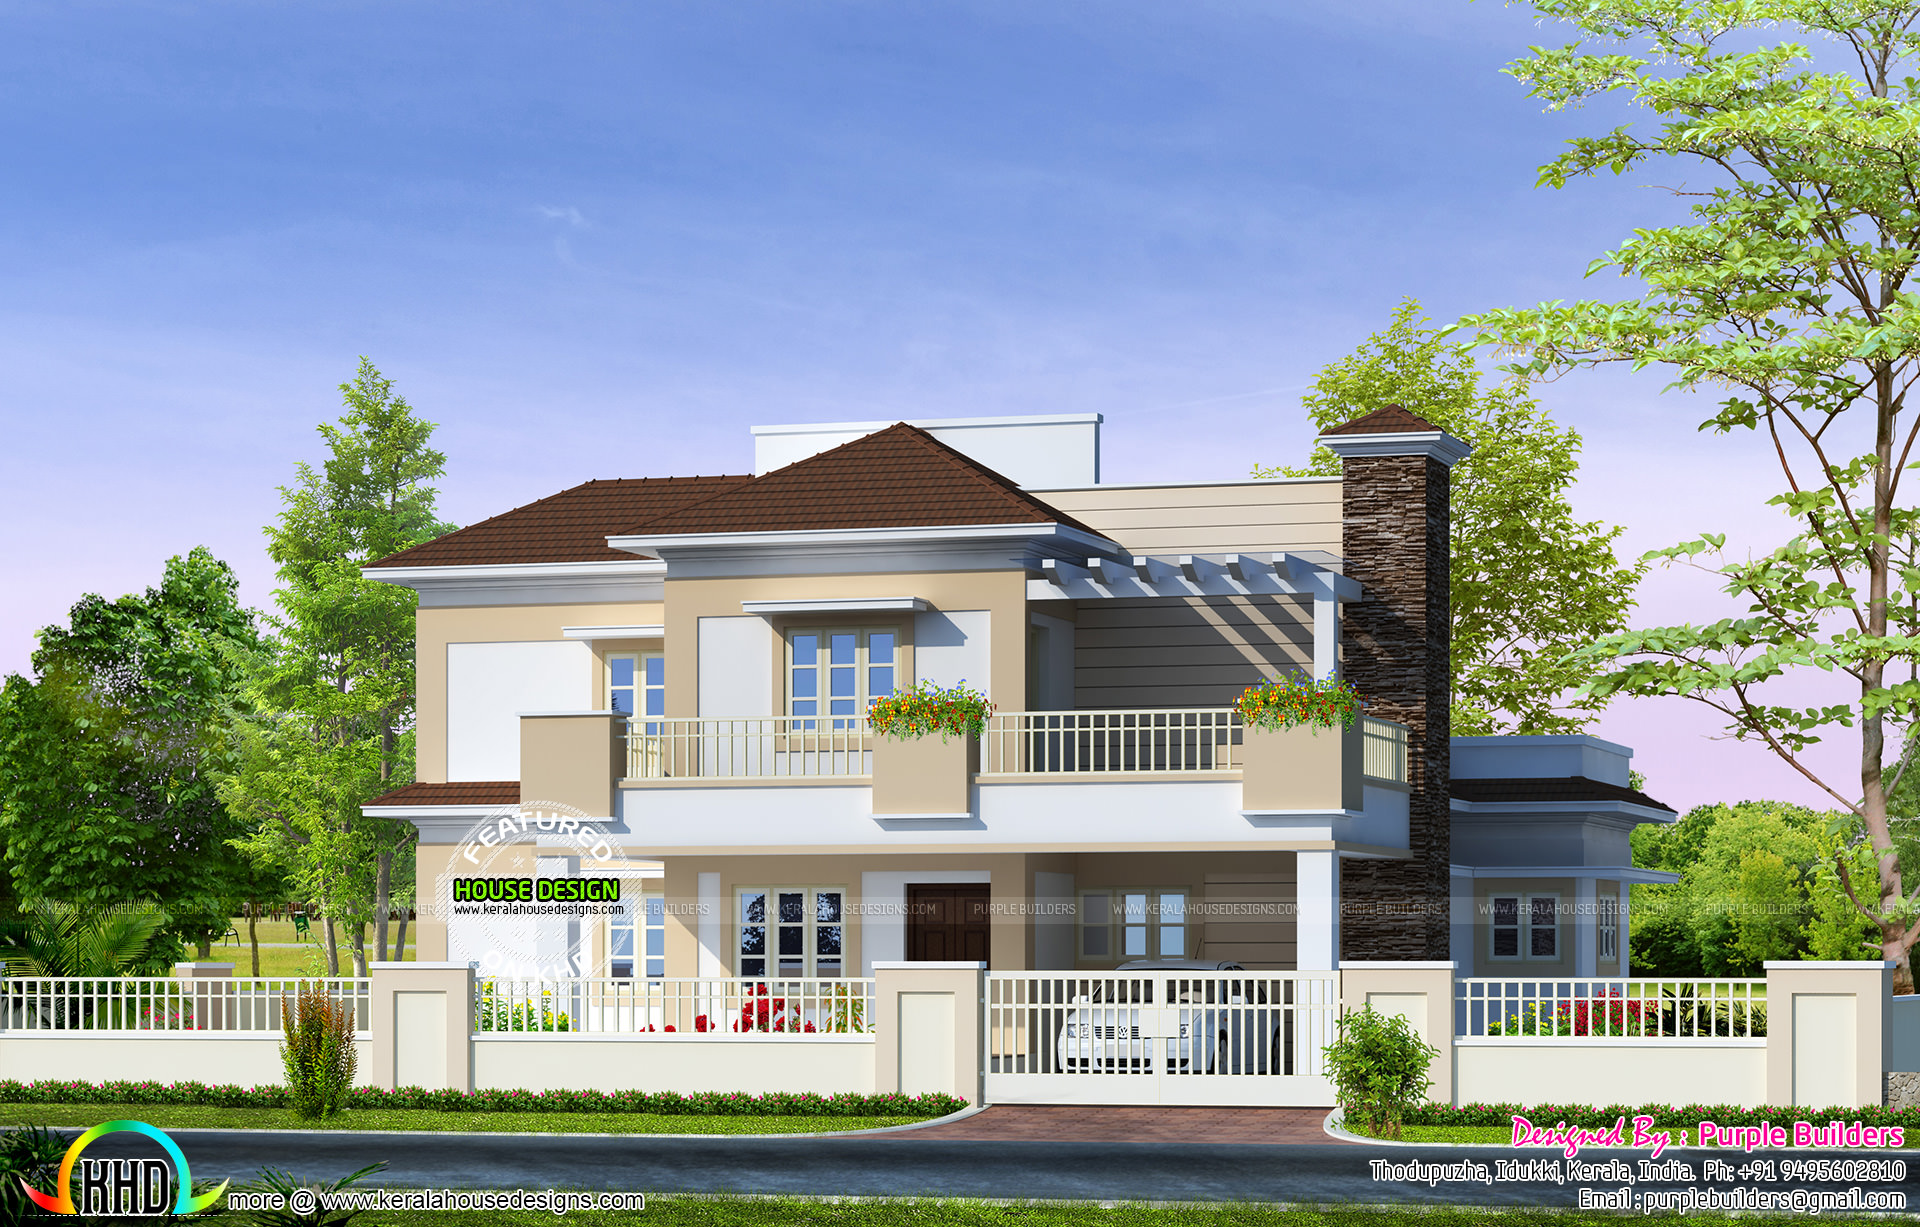 Double Floor Kerala Home Design 1100 Square Feet: 2614 Sq-ft Double Floor Home Plan